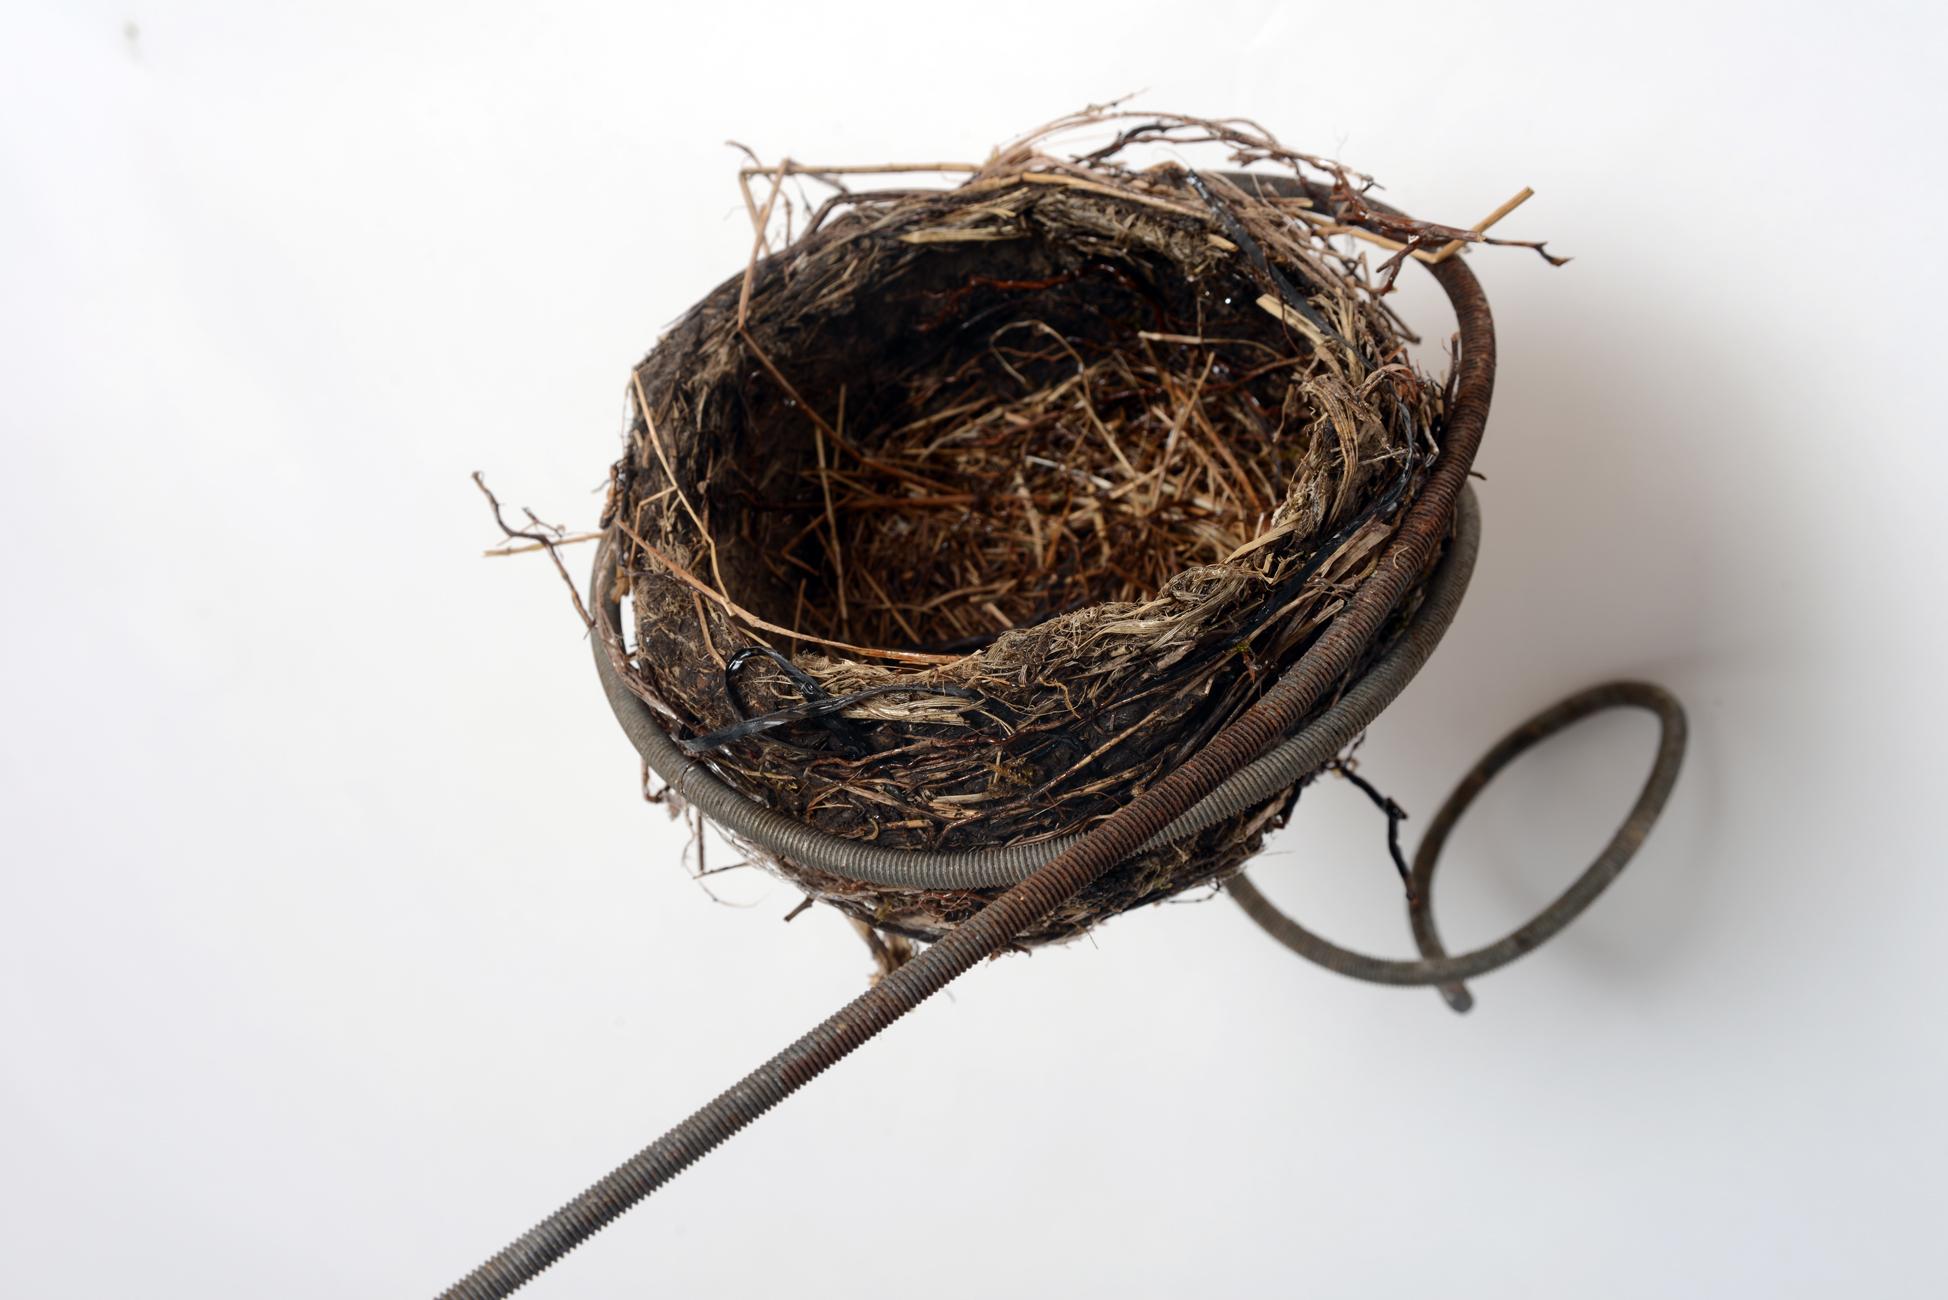 bd-nest-detail